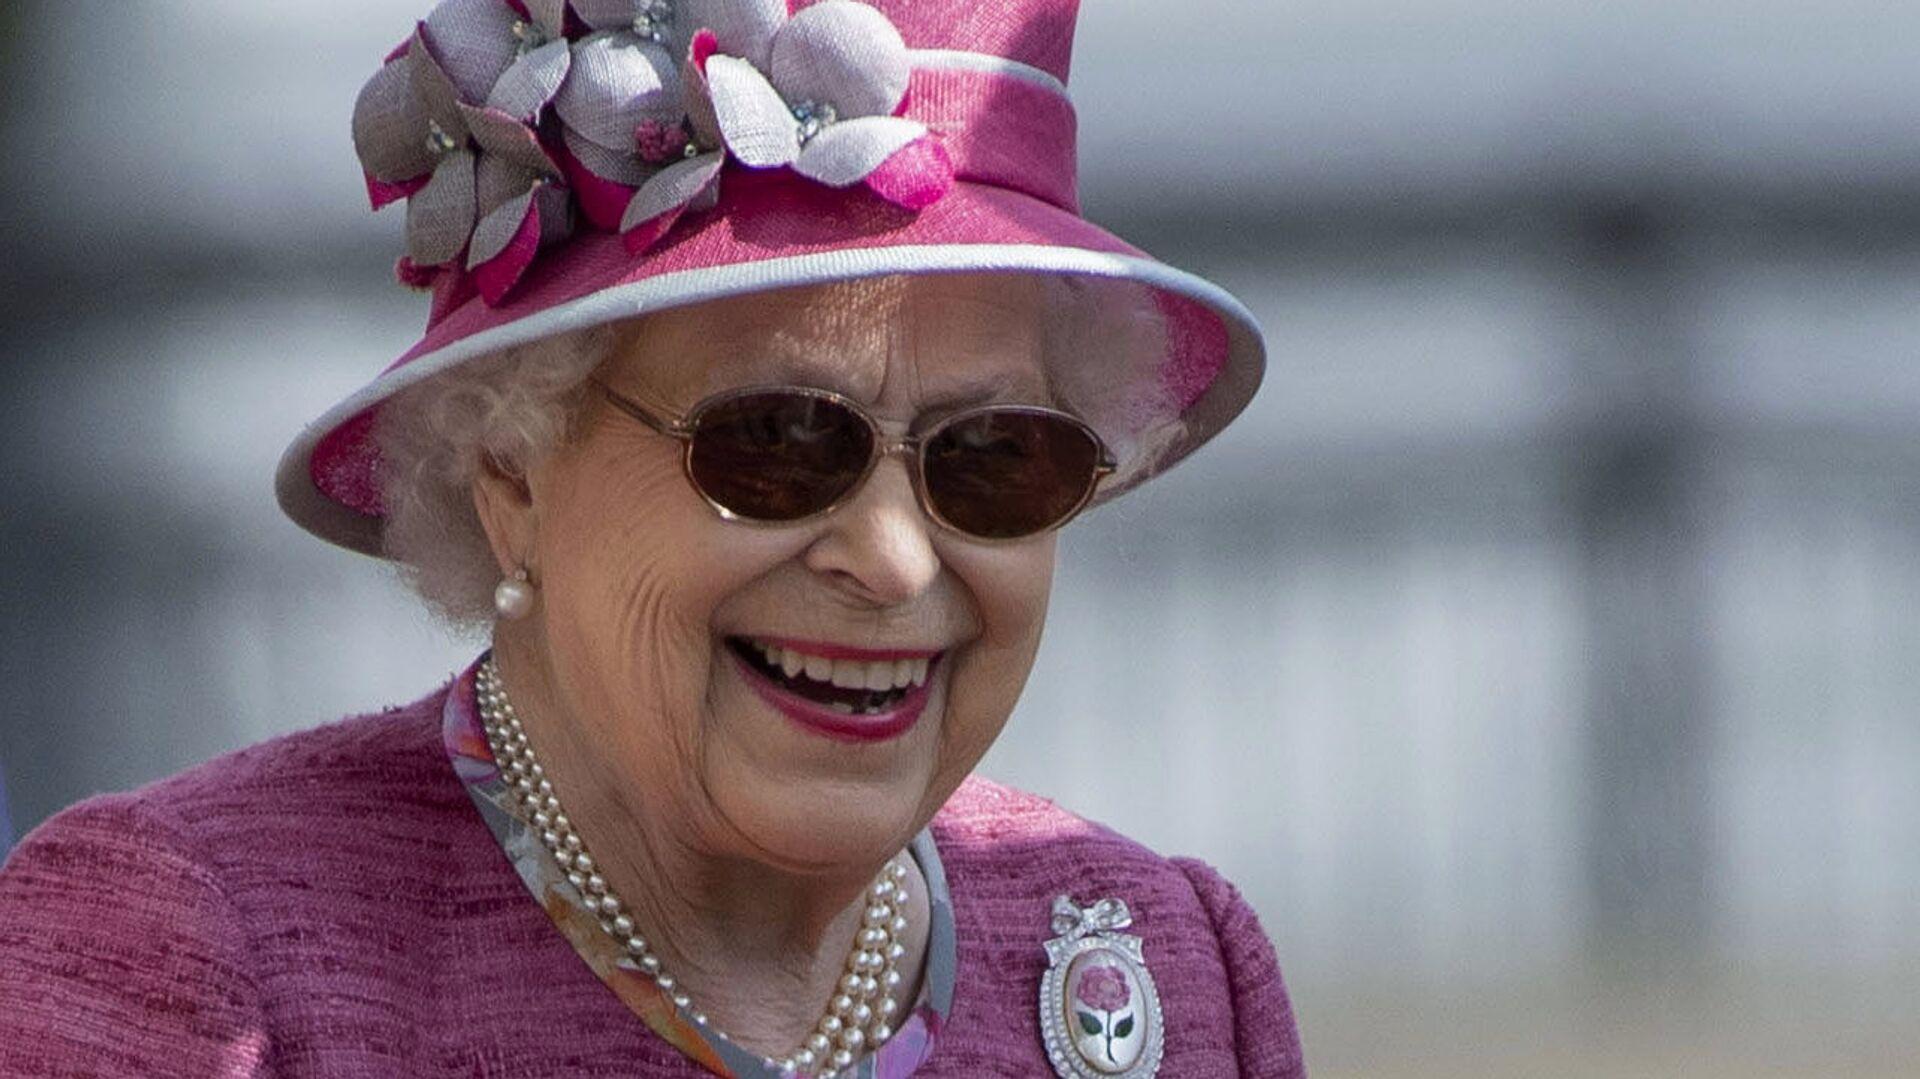 La reina Isabel II del Reino Unido - Sputnik Mundo, 1920, 19.02.2021